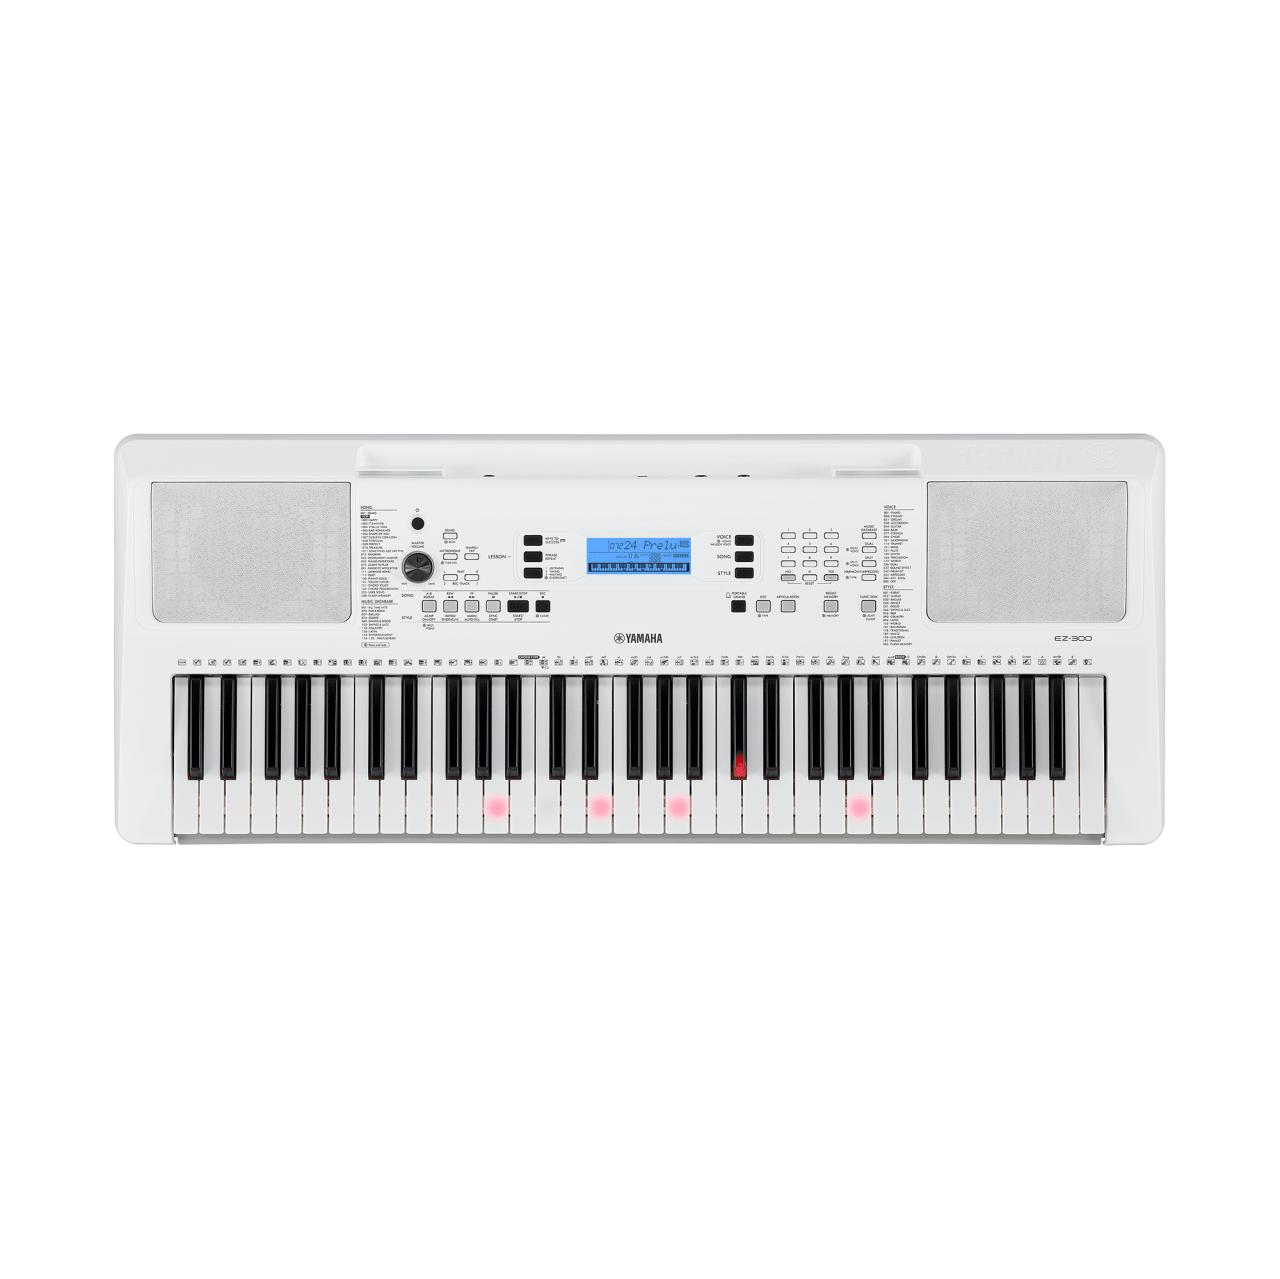 Zilver Wit Yamaha EZ-300 61-sleutels draagbare digitale piano.1